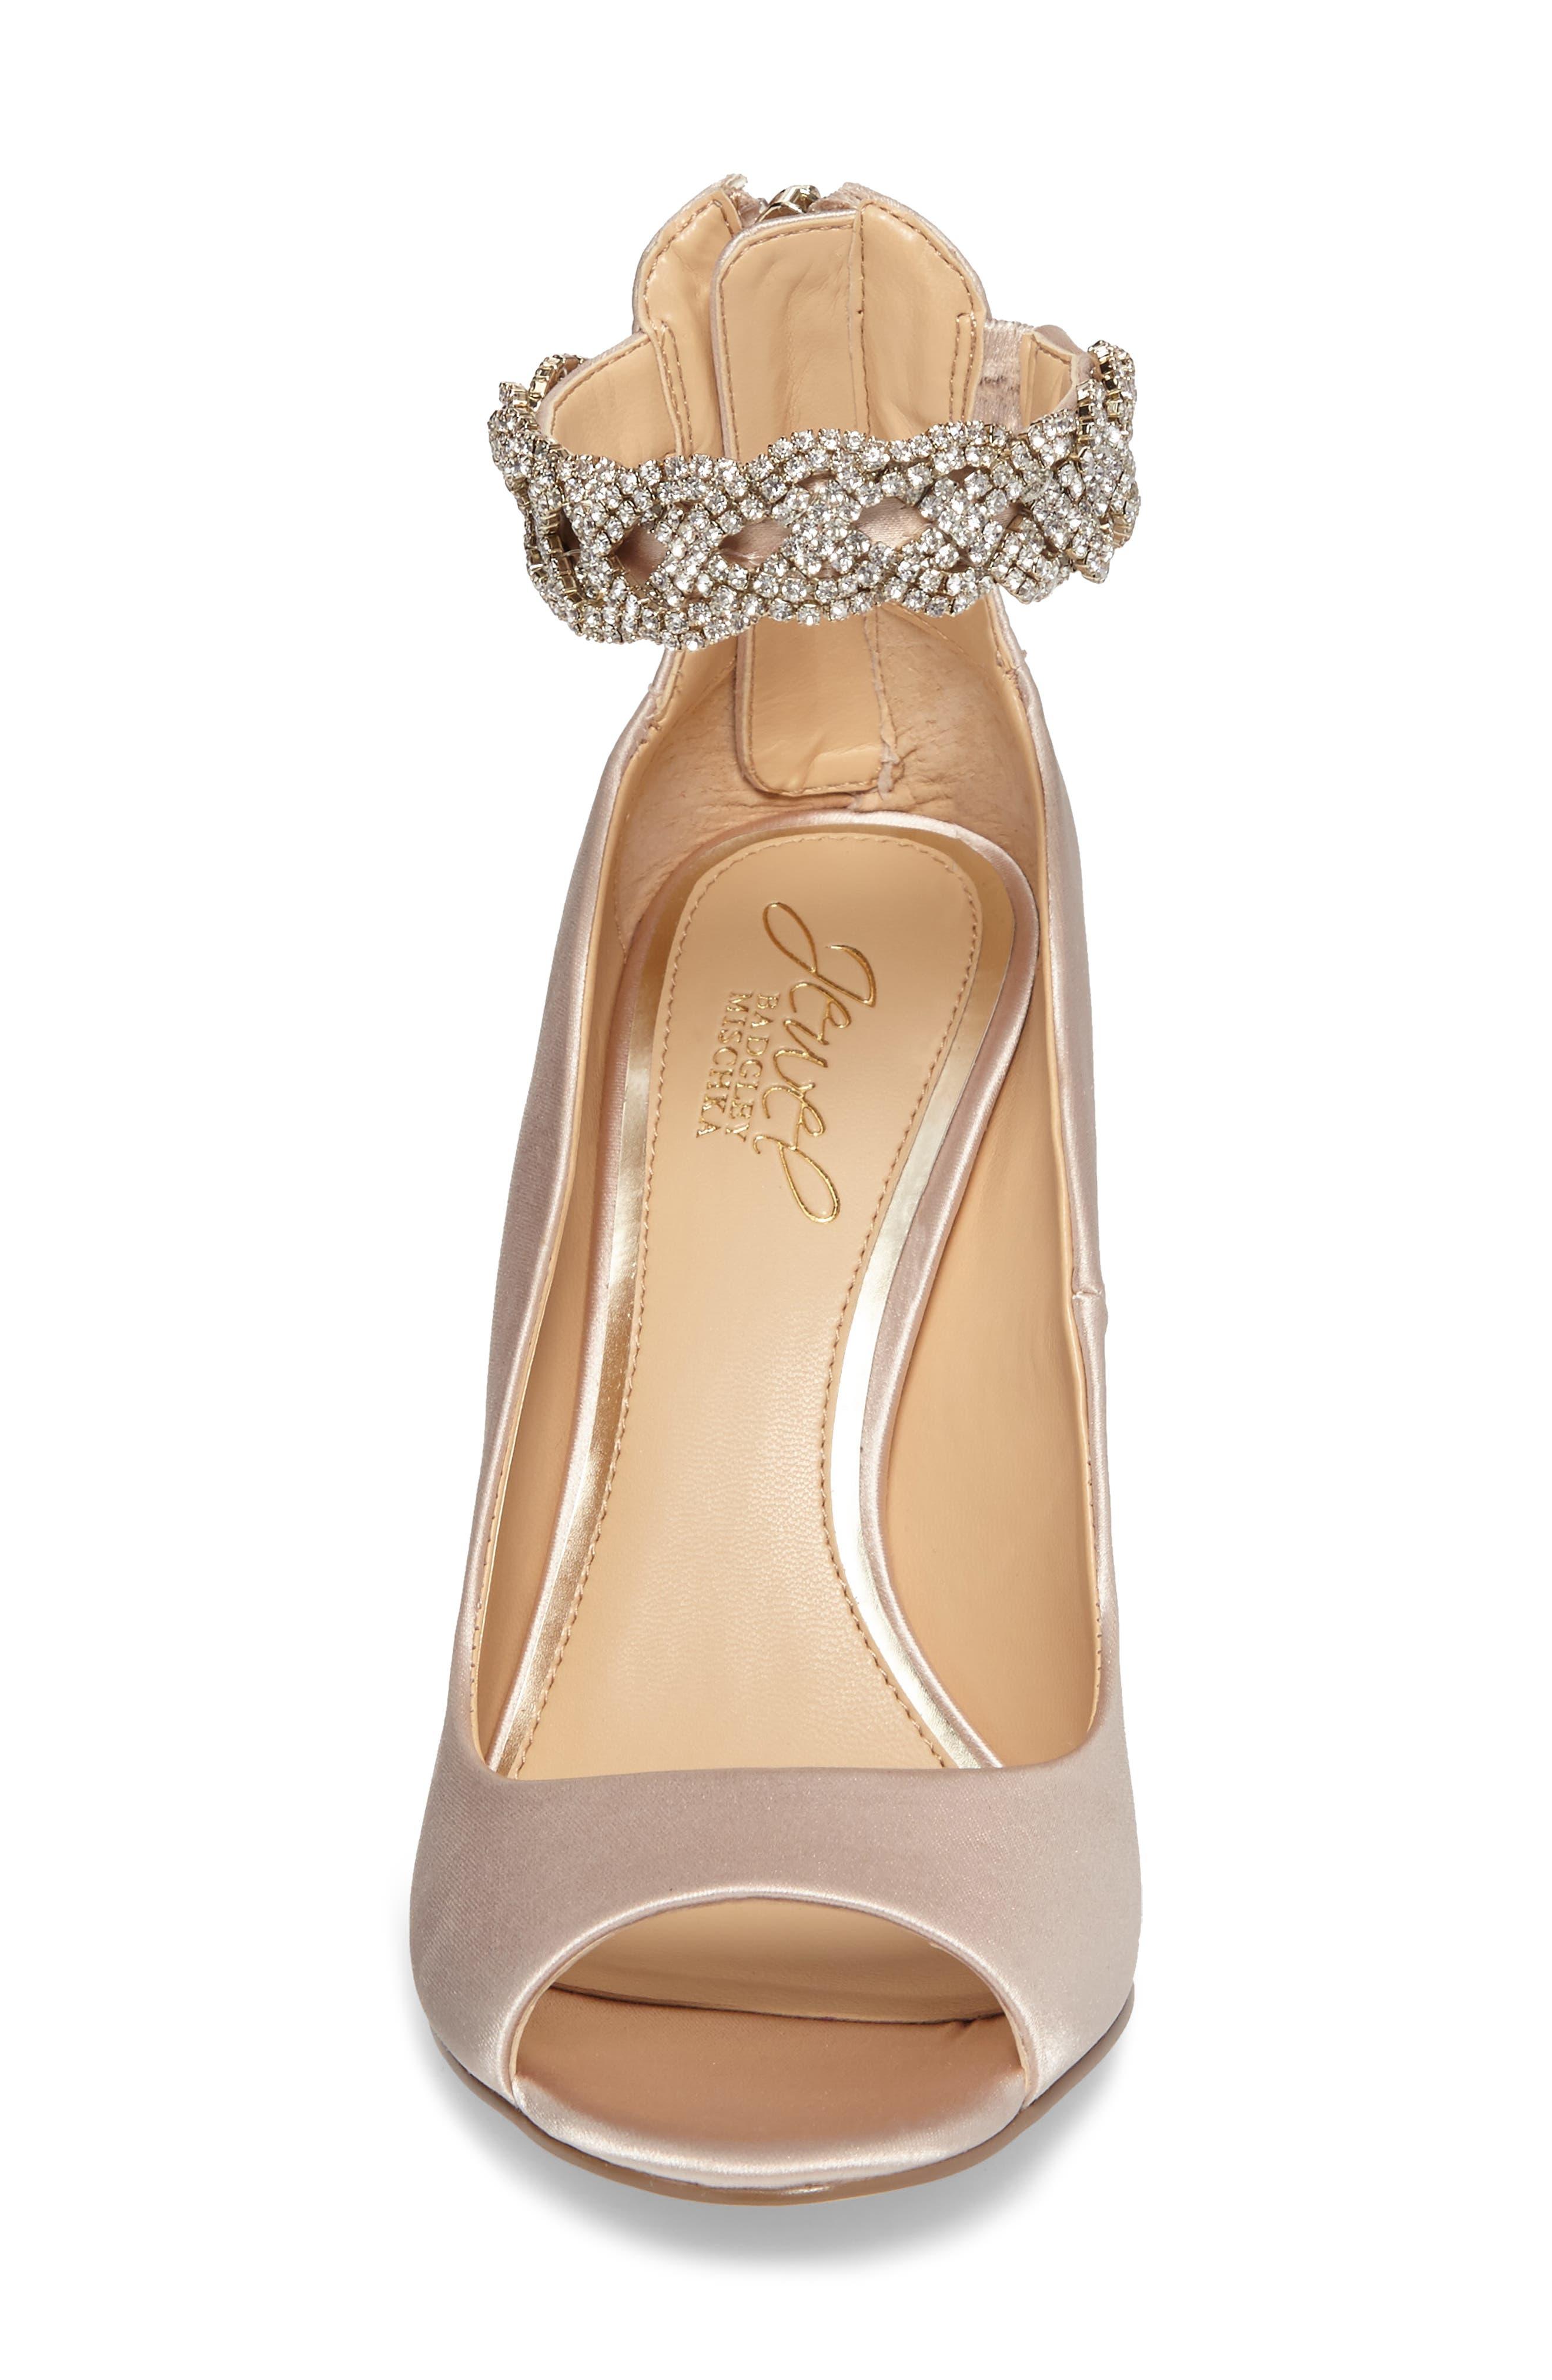 Alanis Embellished Ankle Strap Pump,                             Alternate thumbnail 4, color,                             Champagne Satin